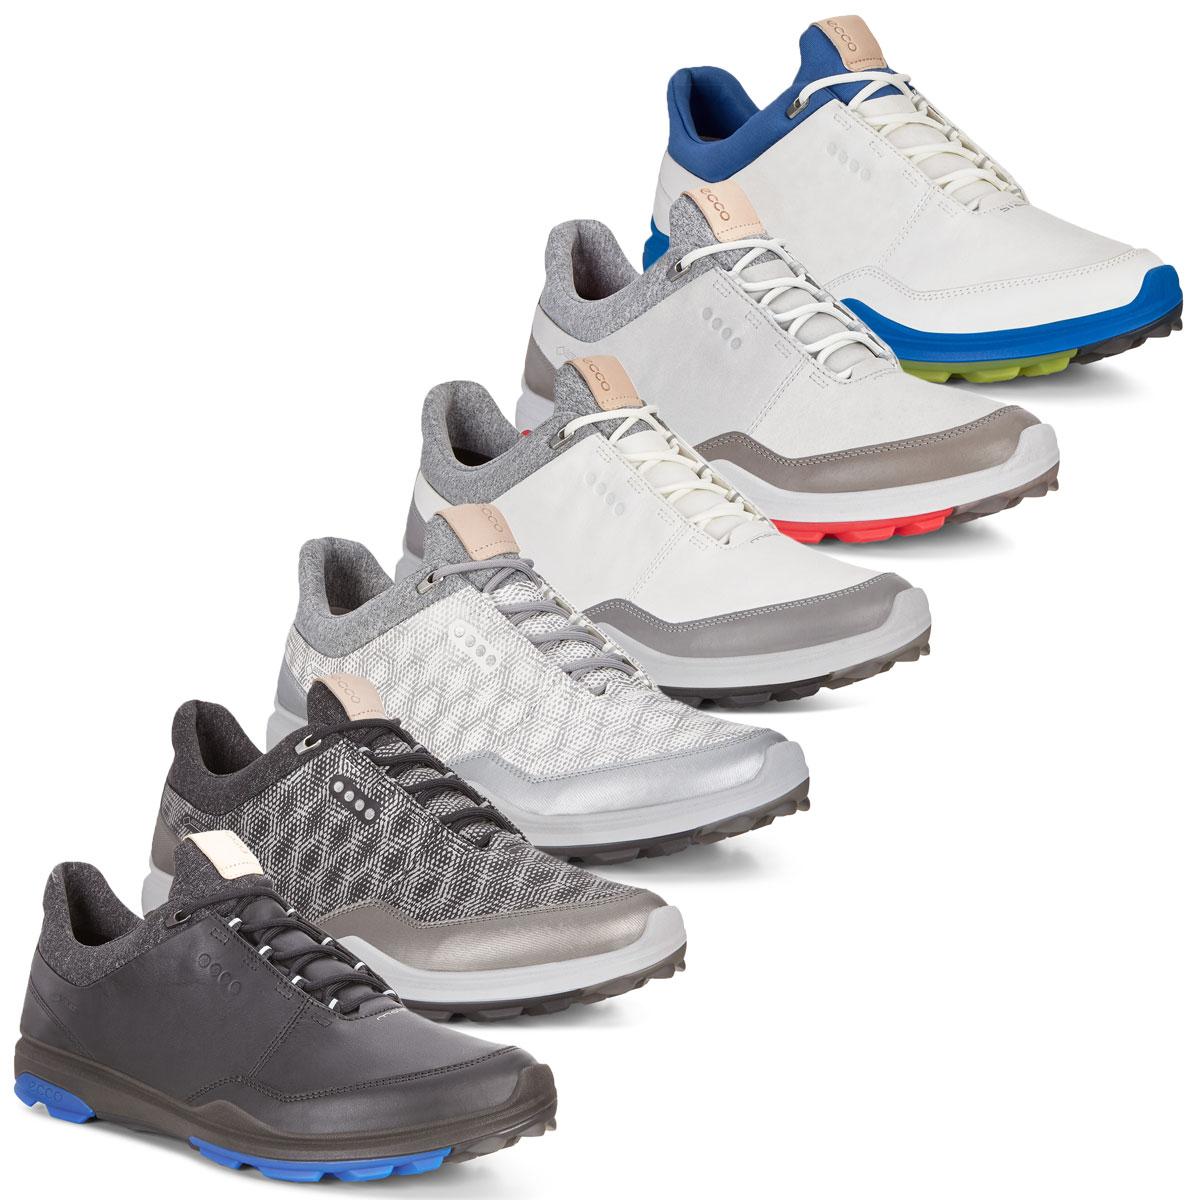 15475c1f6f Details about Ecco Mens M Golf Biom Hybrid 3 Gore-Tex Waterproof Shoes